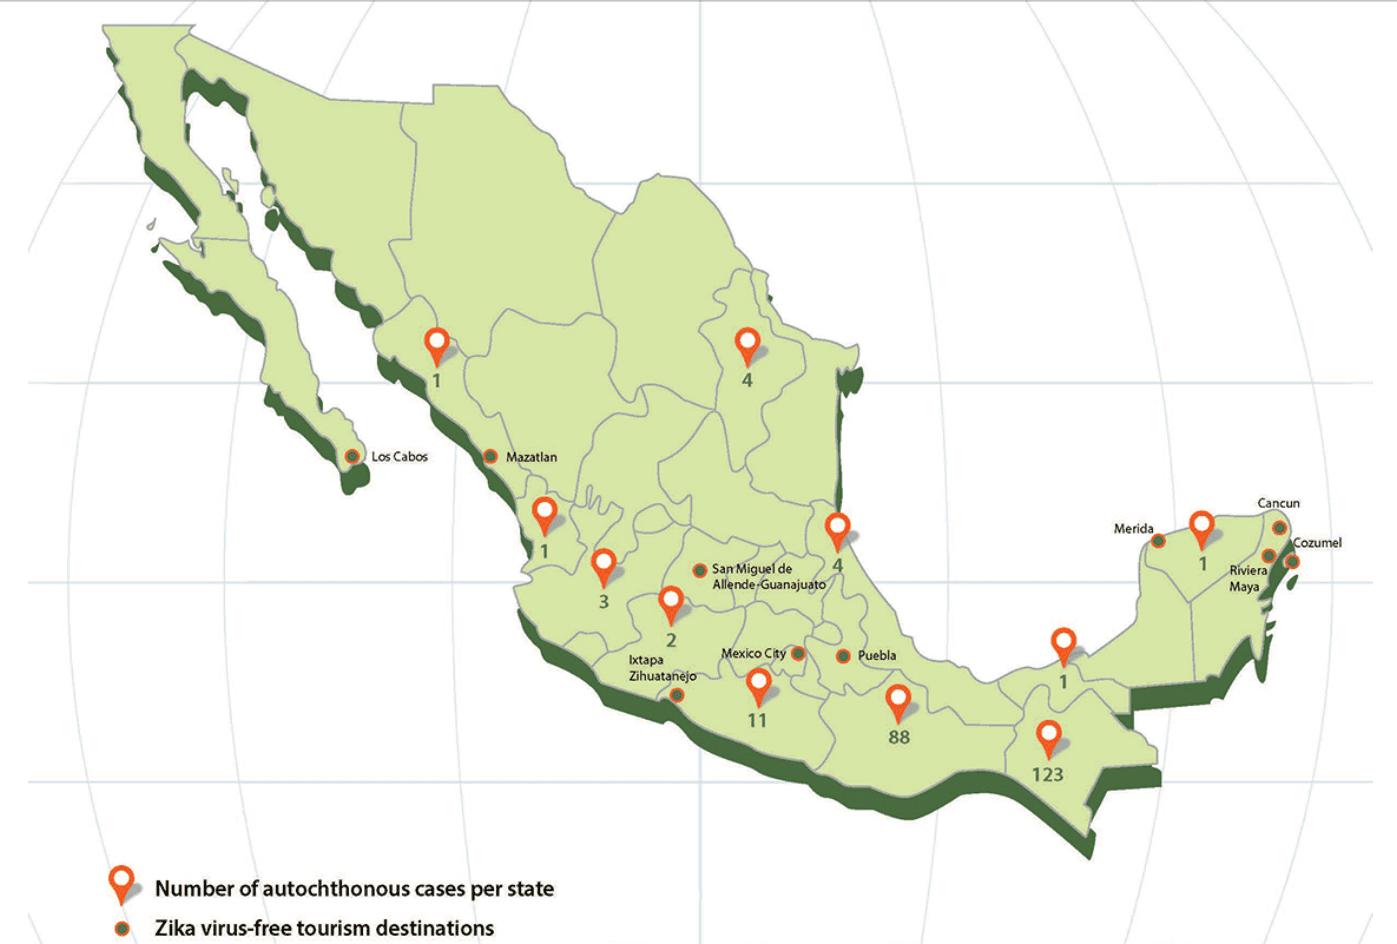 Workbooks las posadas worksheets : Christmas Posadas Tradition in Mexico